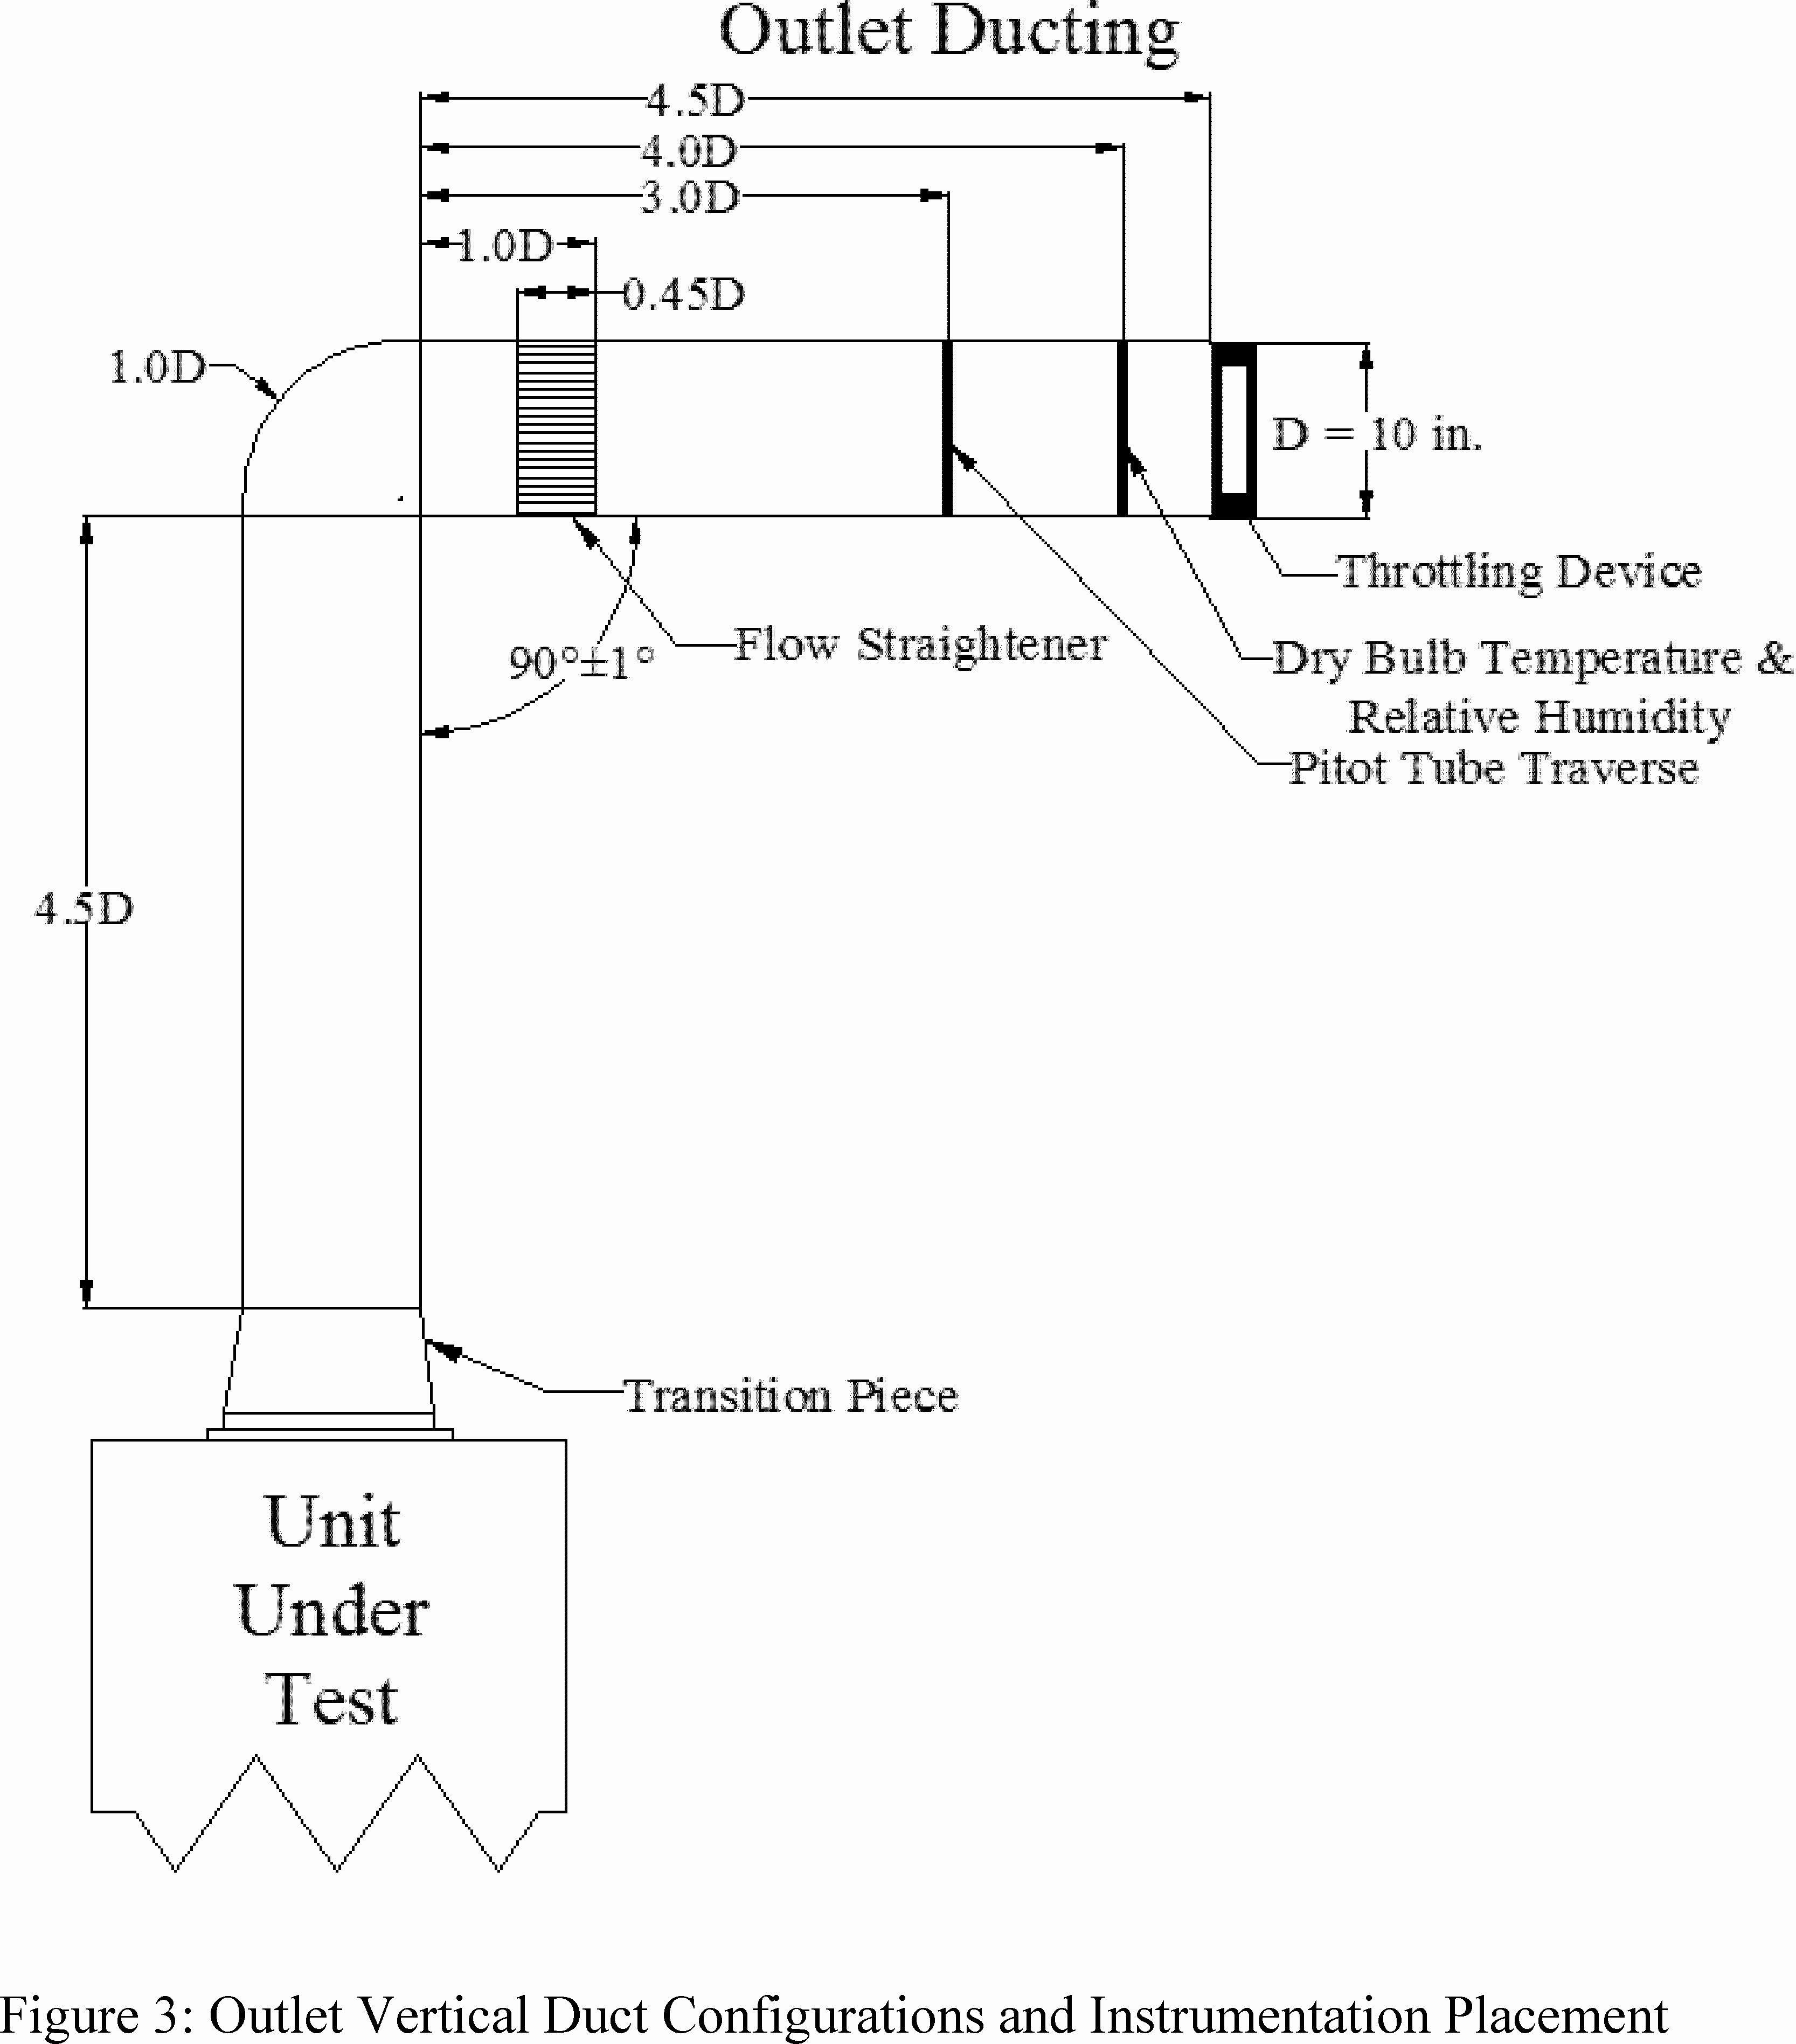 Jeep 4 0 Engine Diagram 2 Ac Electrical Diagram Luxury Wiring Diagram Ac Best Wiring Diagram Of Jeep 4 0 Engine Diagram 2